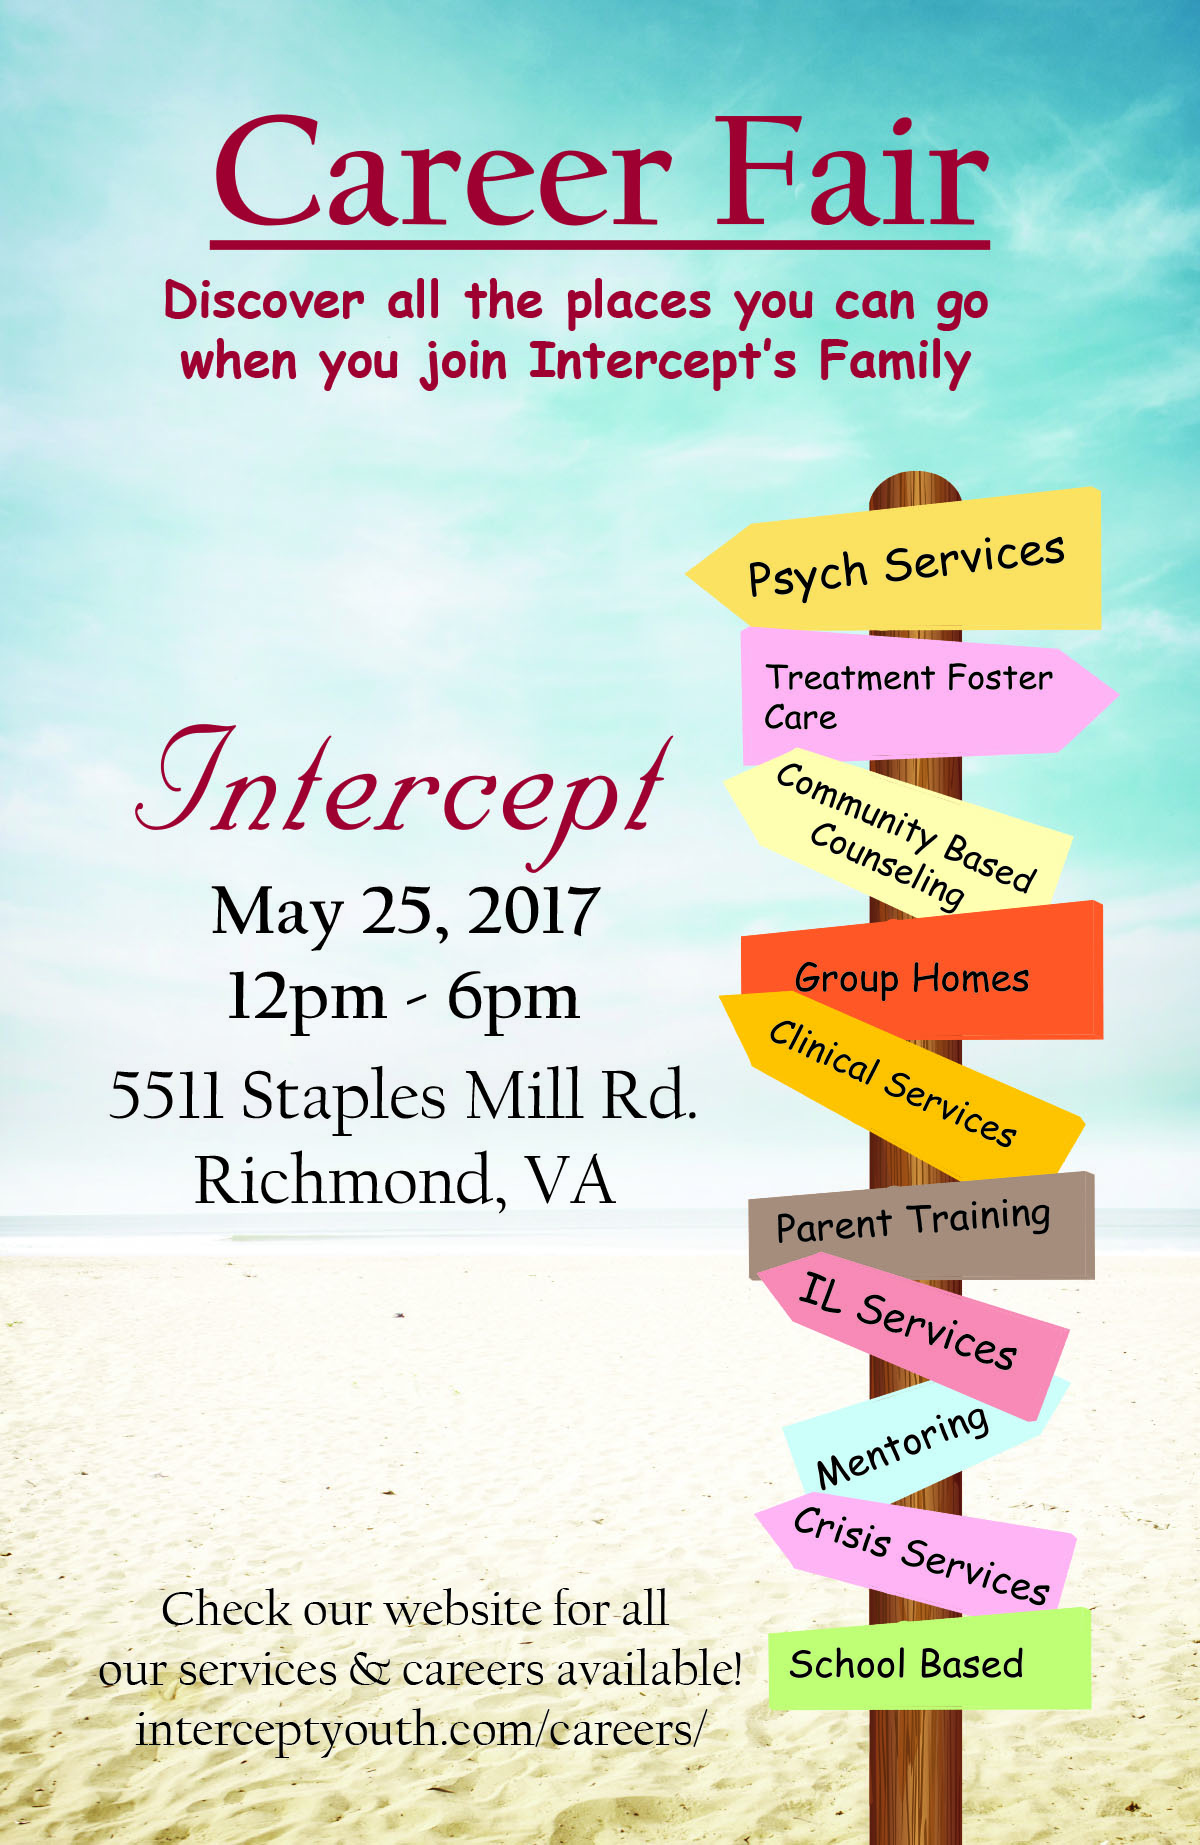 Intercept Youth Services Job Fair | Virginia Employment Commission